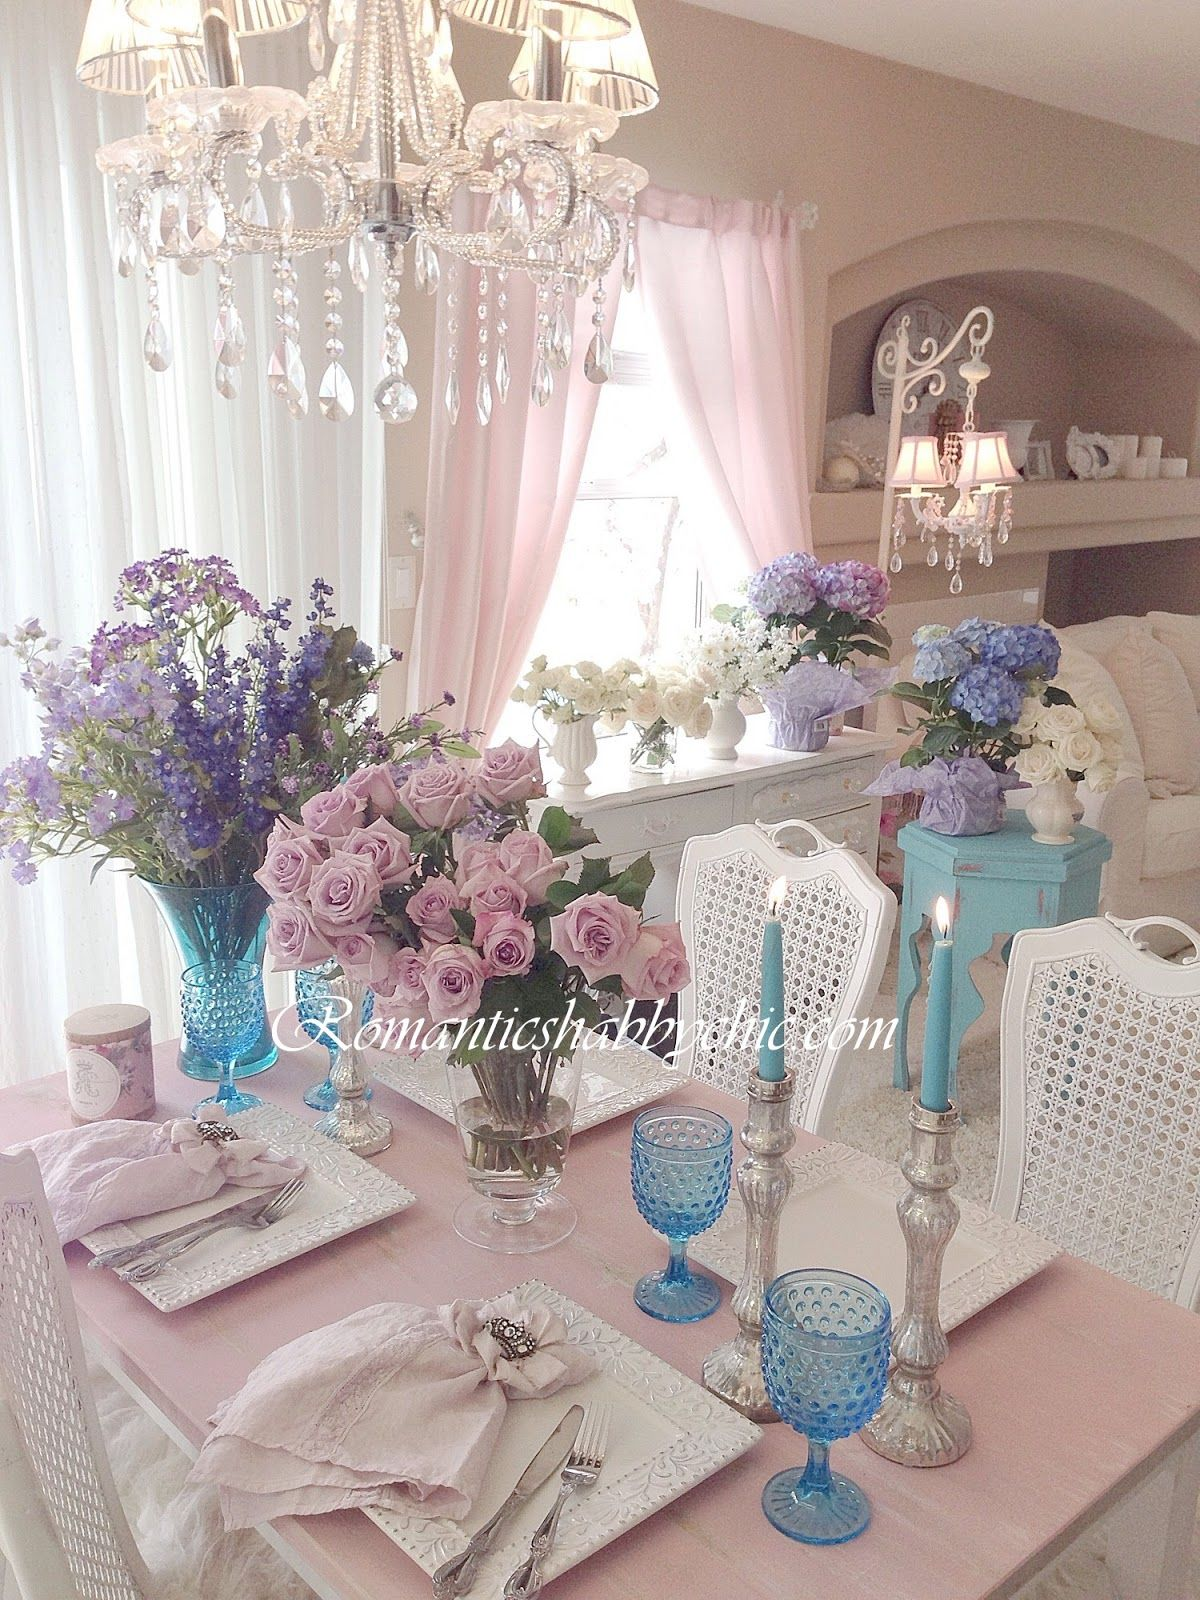 Romantic shabby chic home romantic shabby chic blog - Romantic Shabby Chic Home Turquoise Details Purple Flowers